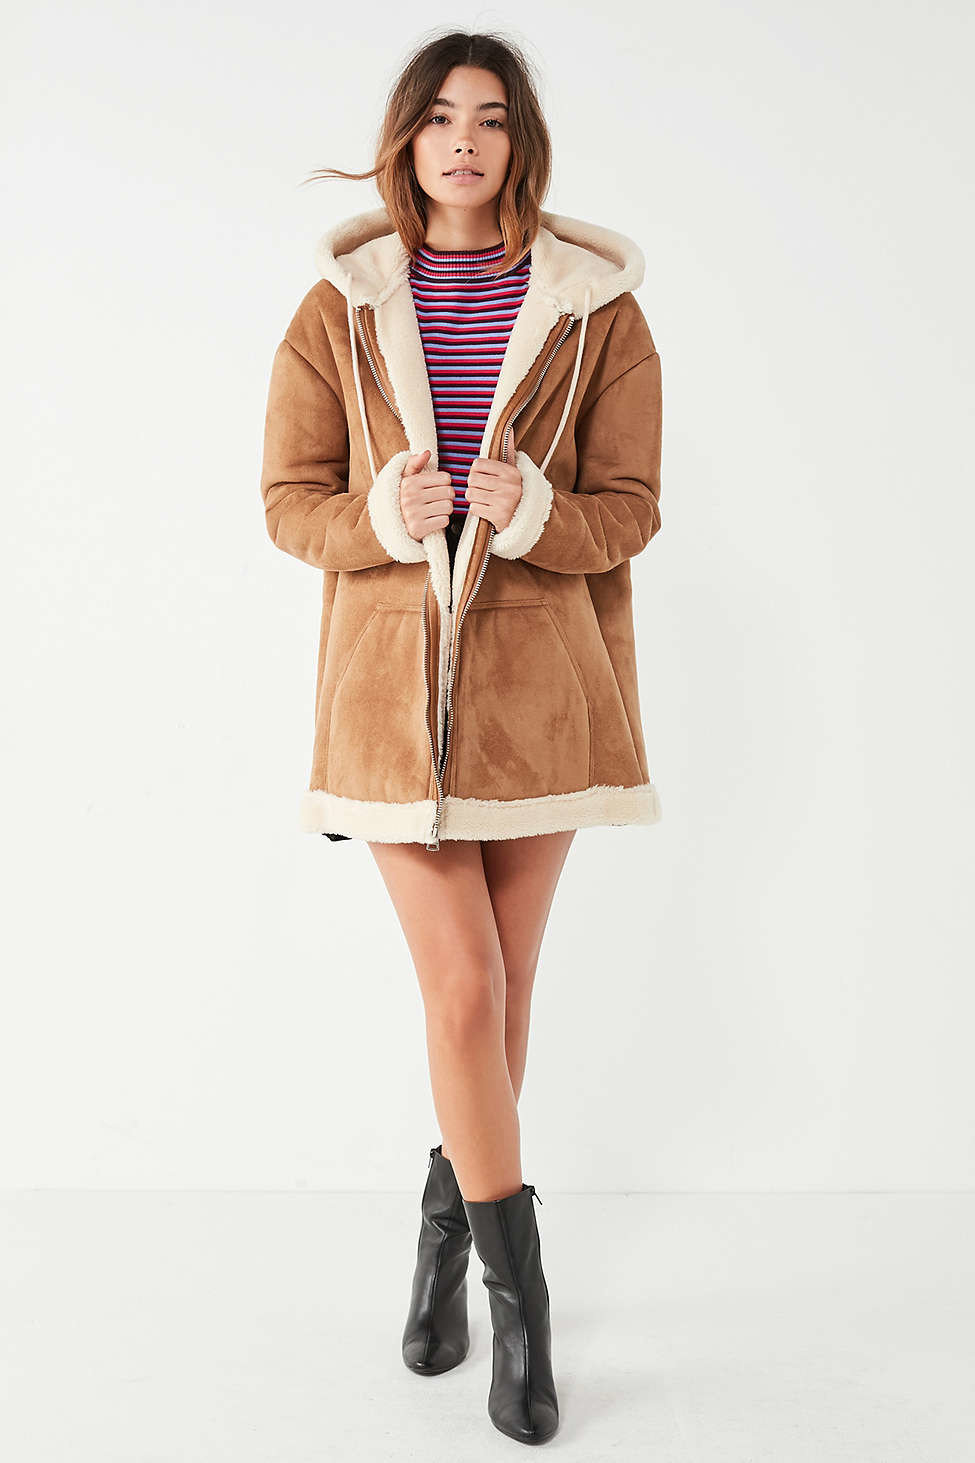 Style + Design Travel Shop person woman fashion model coat fur clothing fashion posing fur overcoat supermodel dressed tan